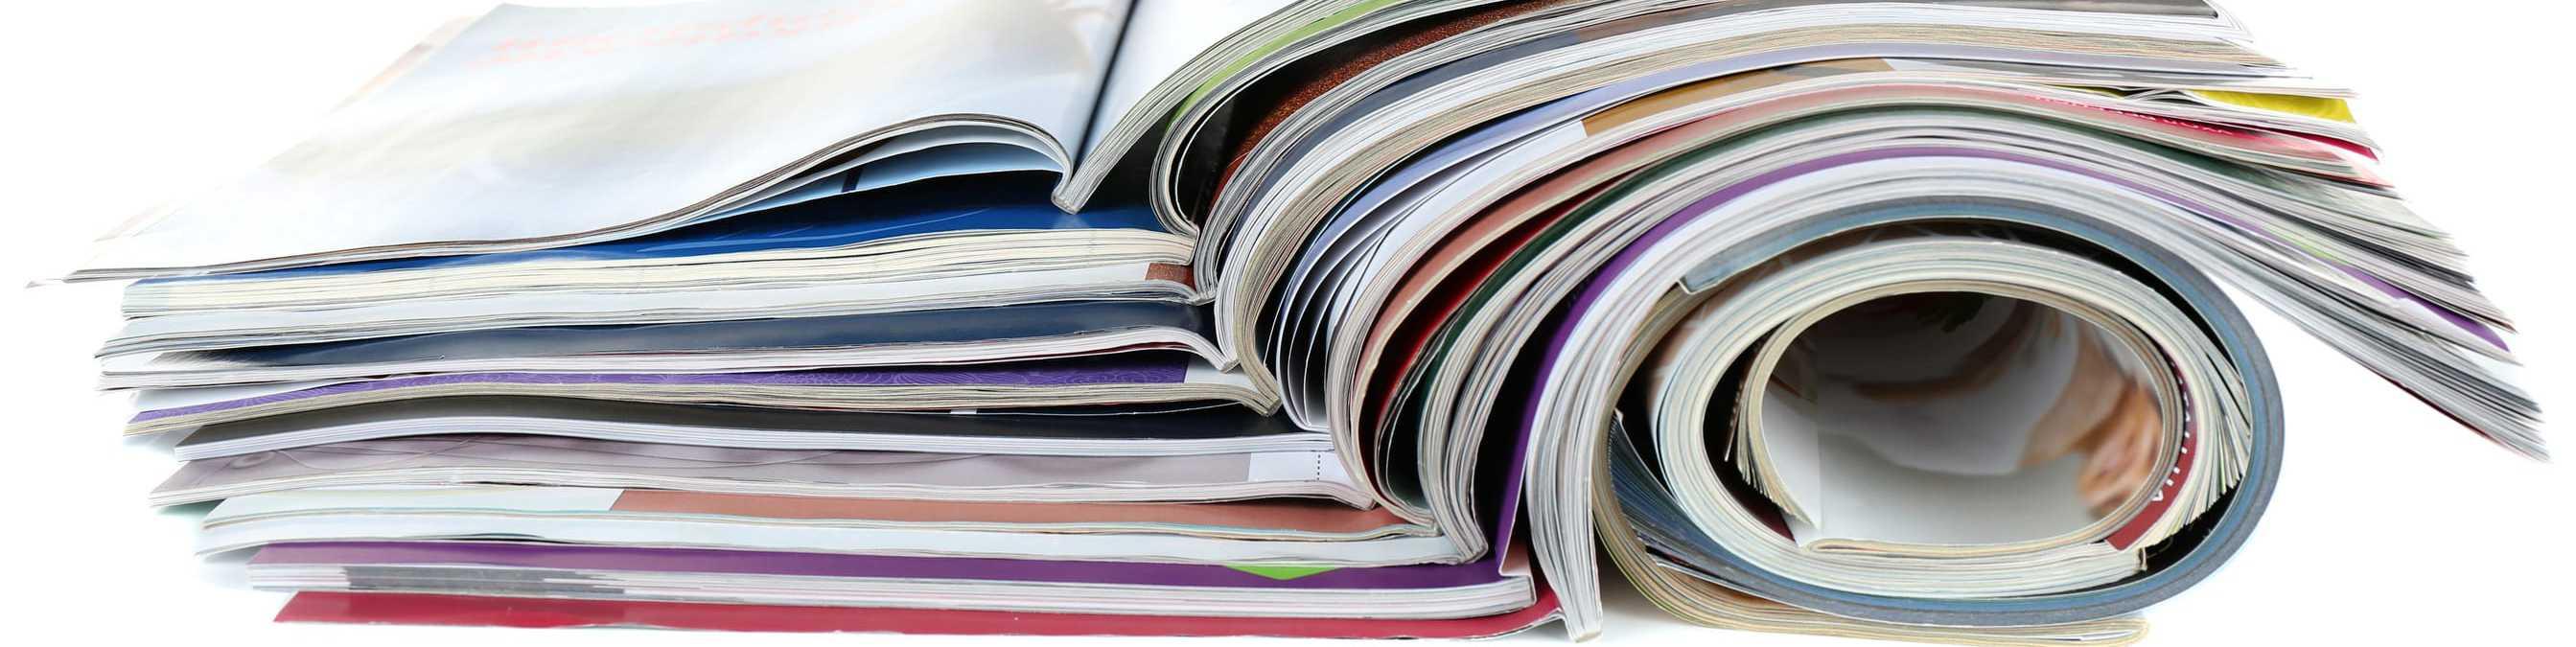 Broschürenstapel, Zeitungen